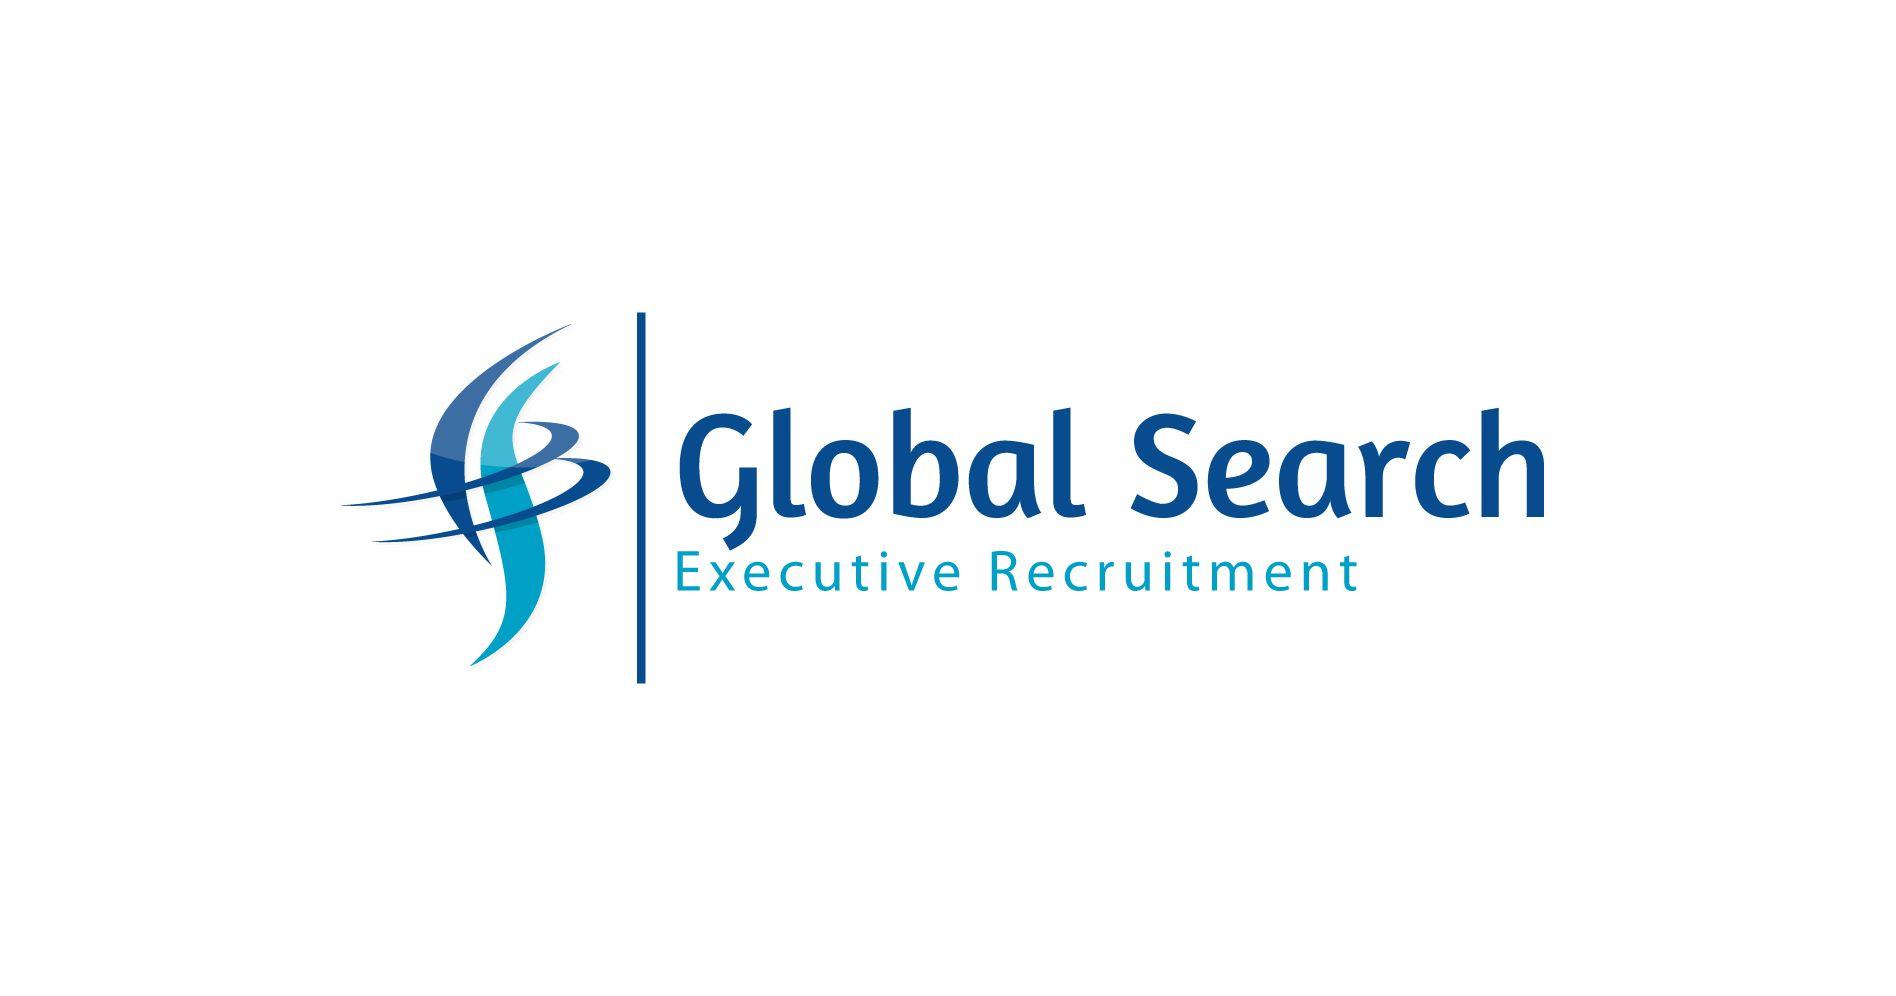 globalsearch Logo